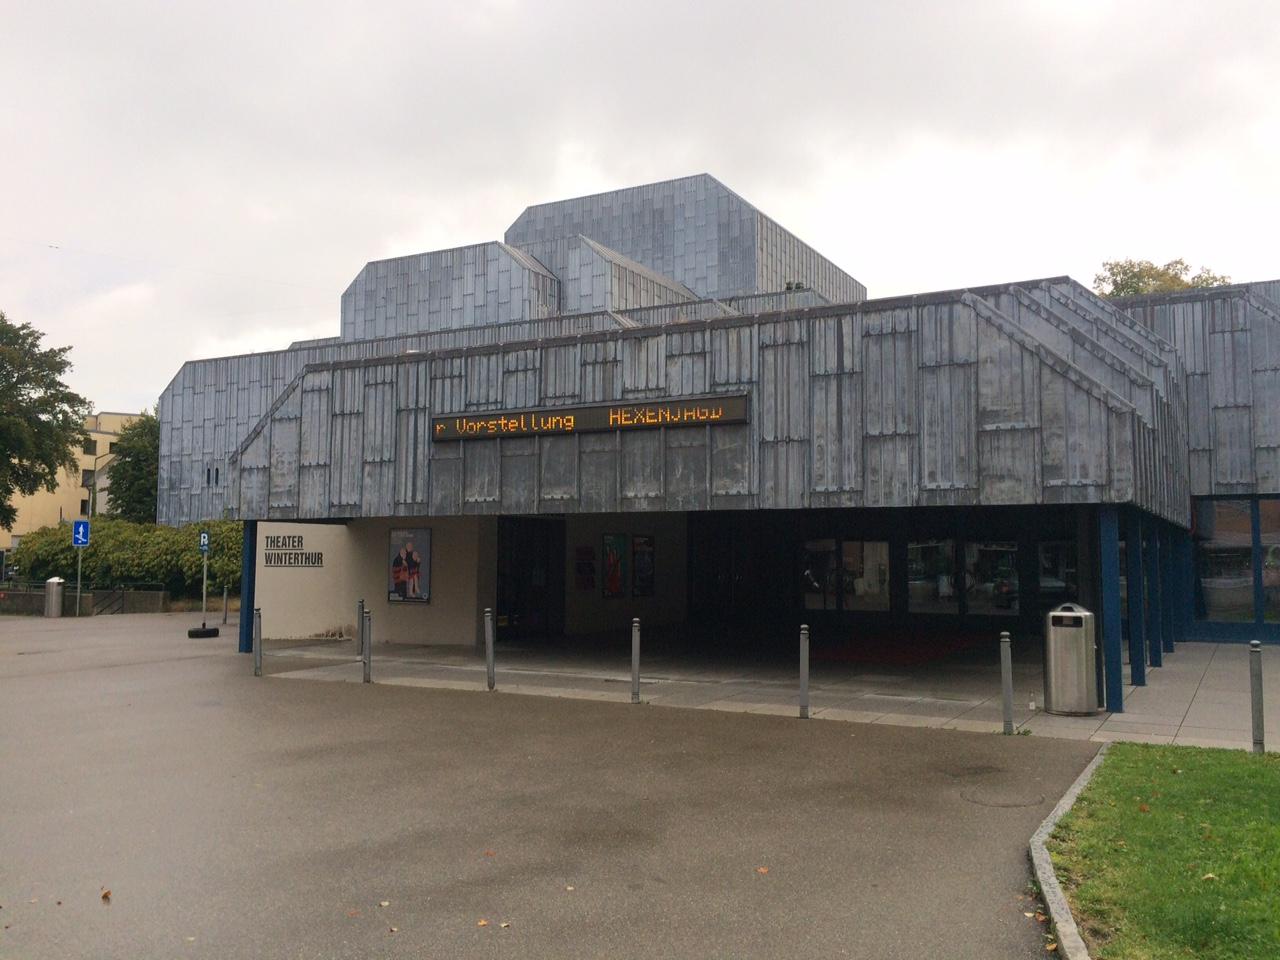 Kapitalerhöhung Theater Winterthur AG